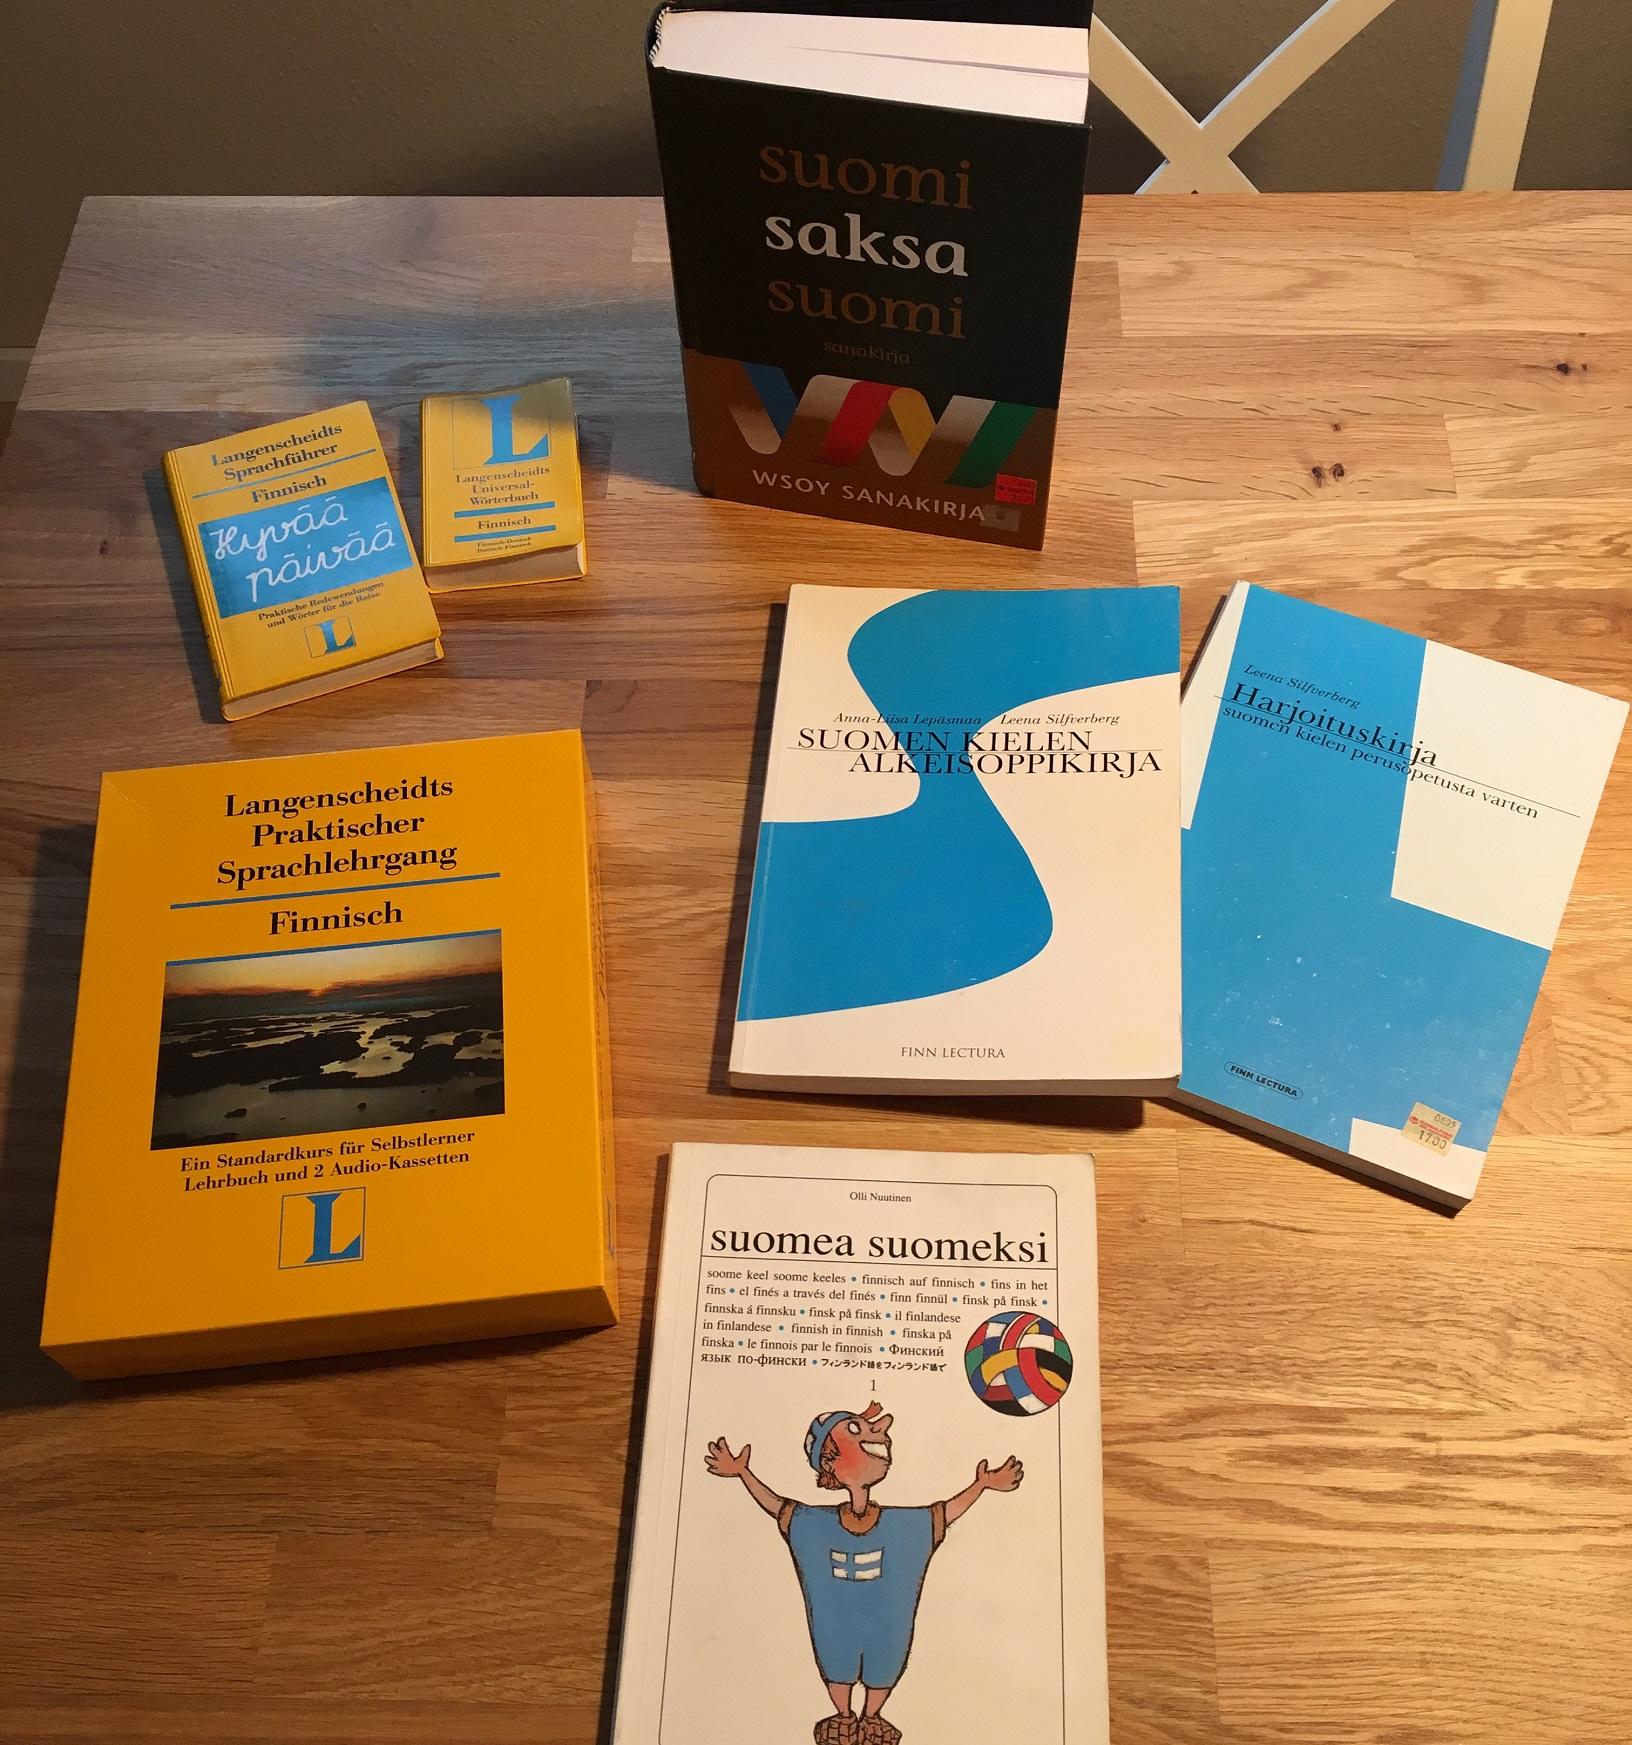 Bücher zum Finnisch lernen